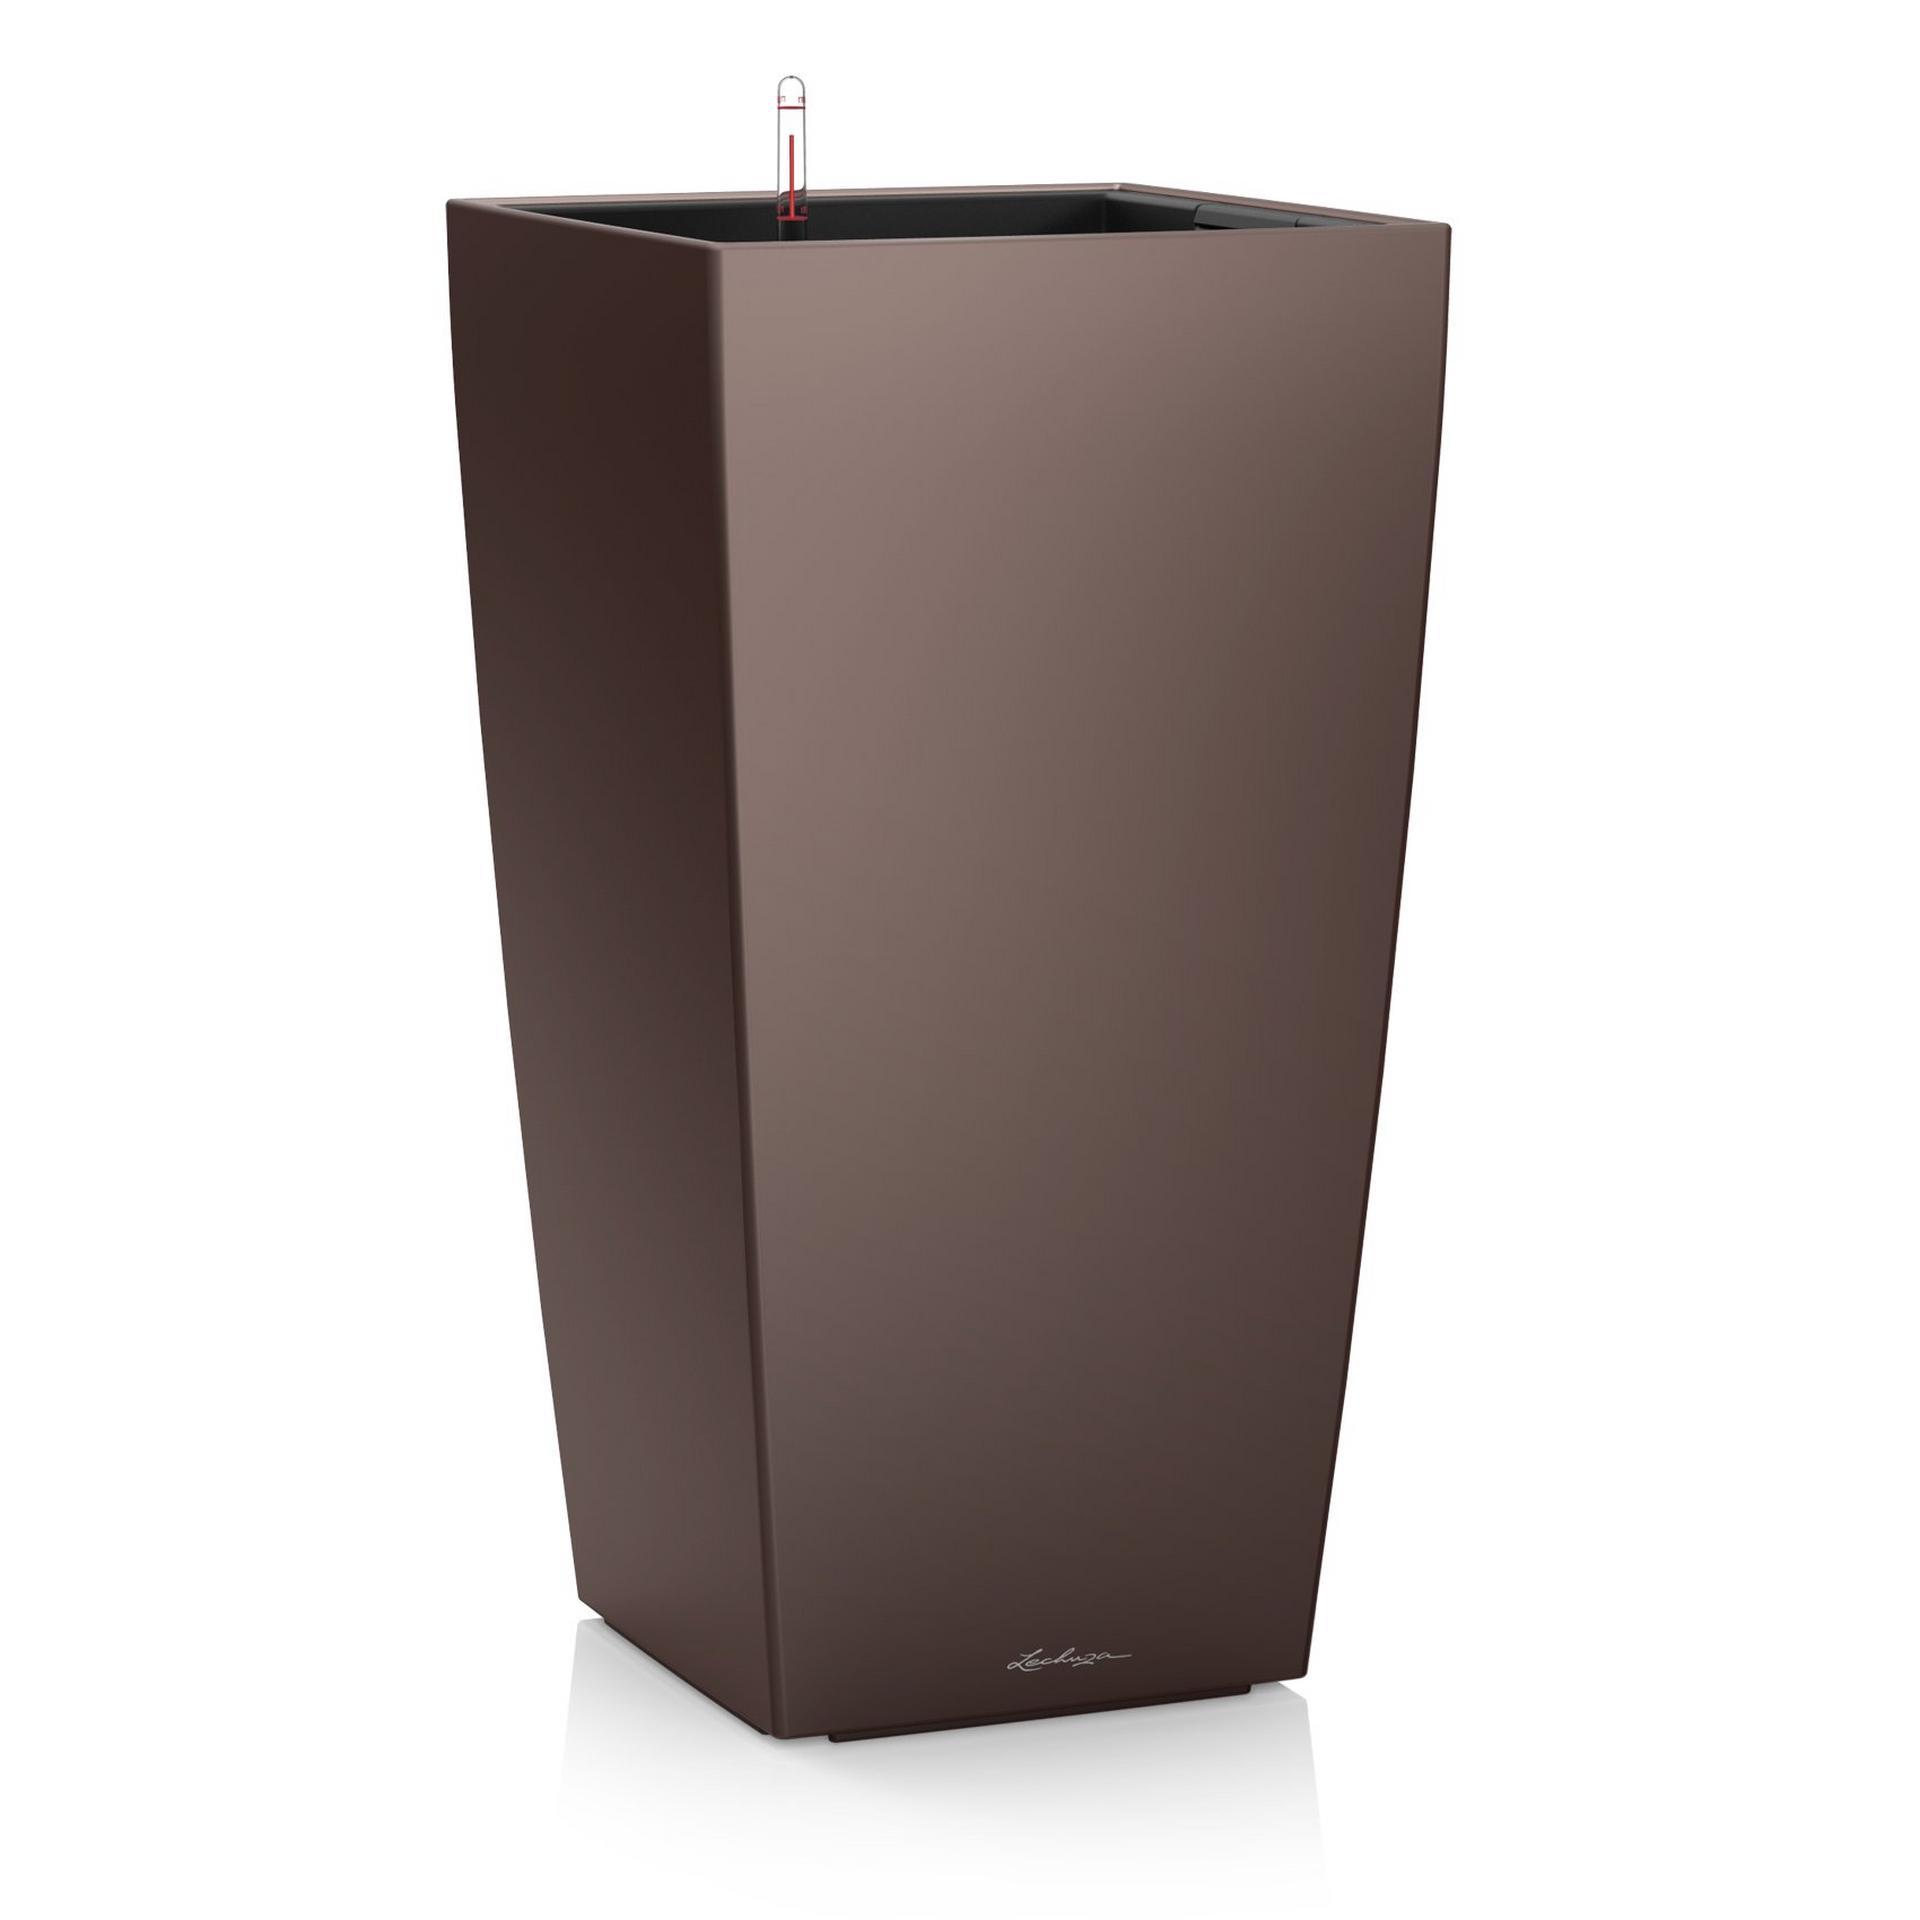 cubico 50 wei hochglanz. Black Bedroom Furniture Sets. Home Design Ideas